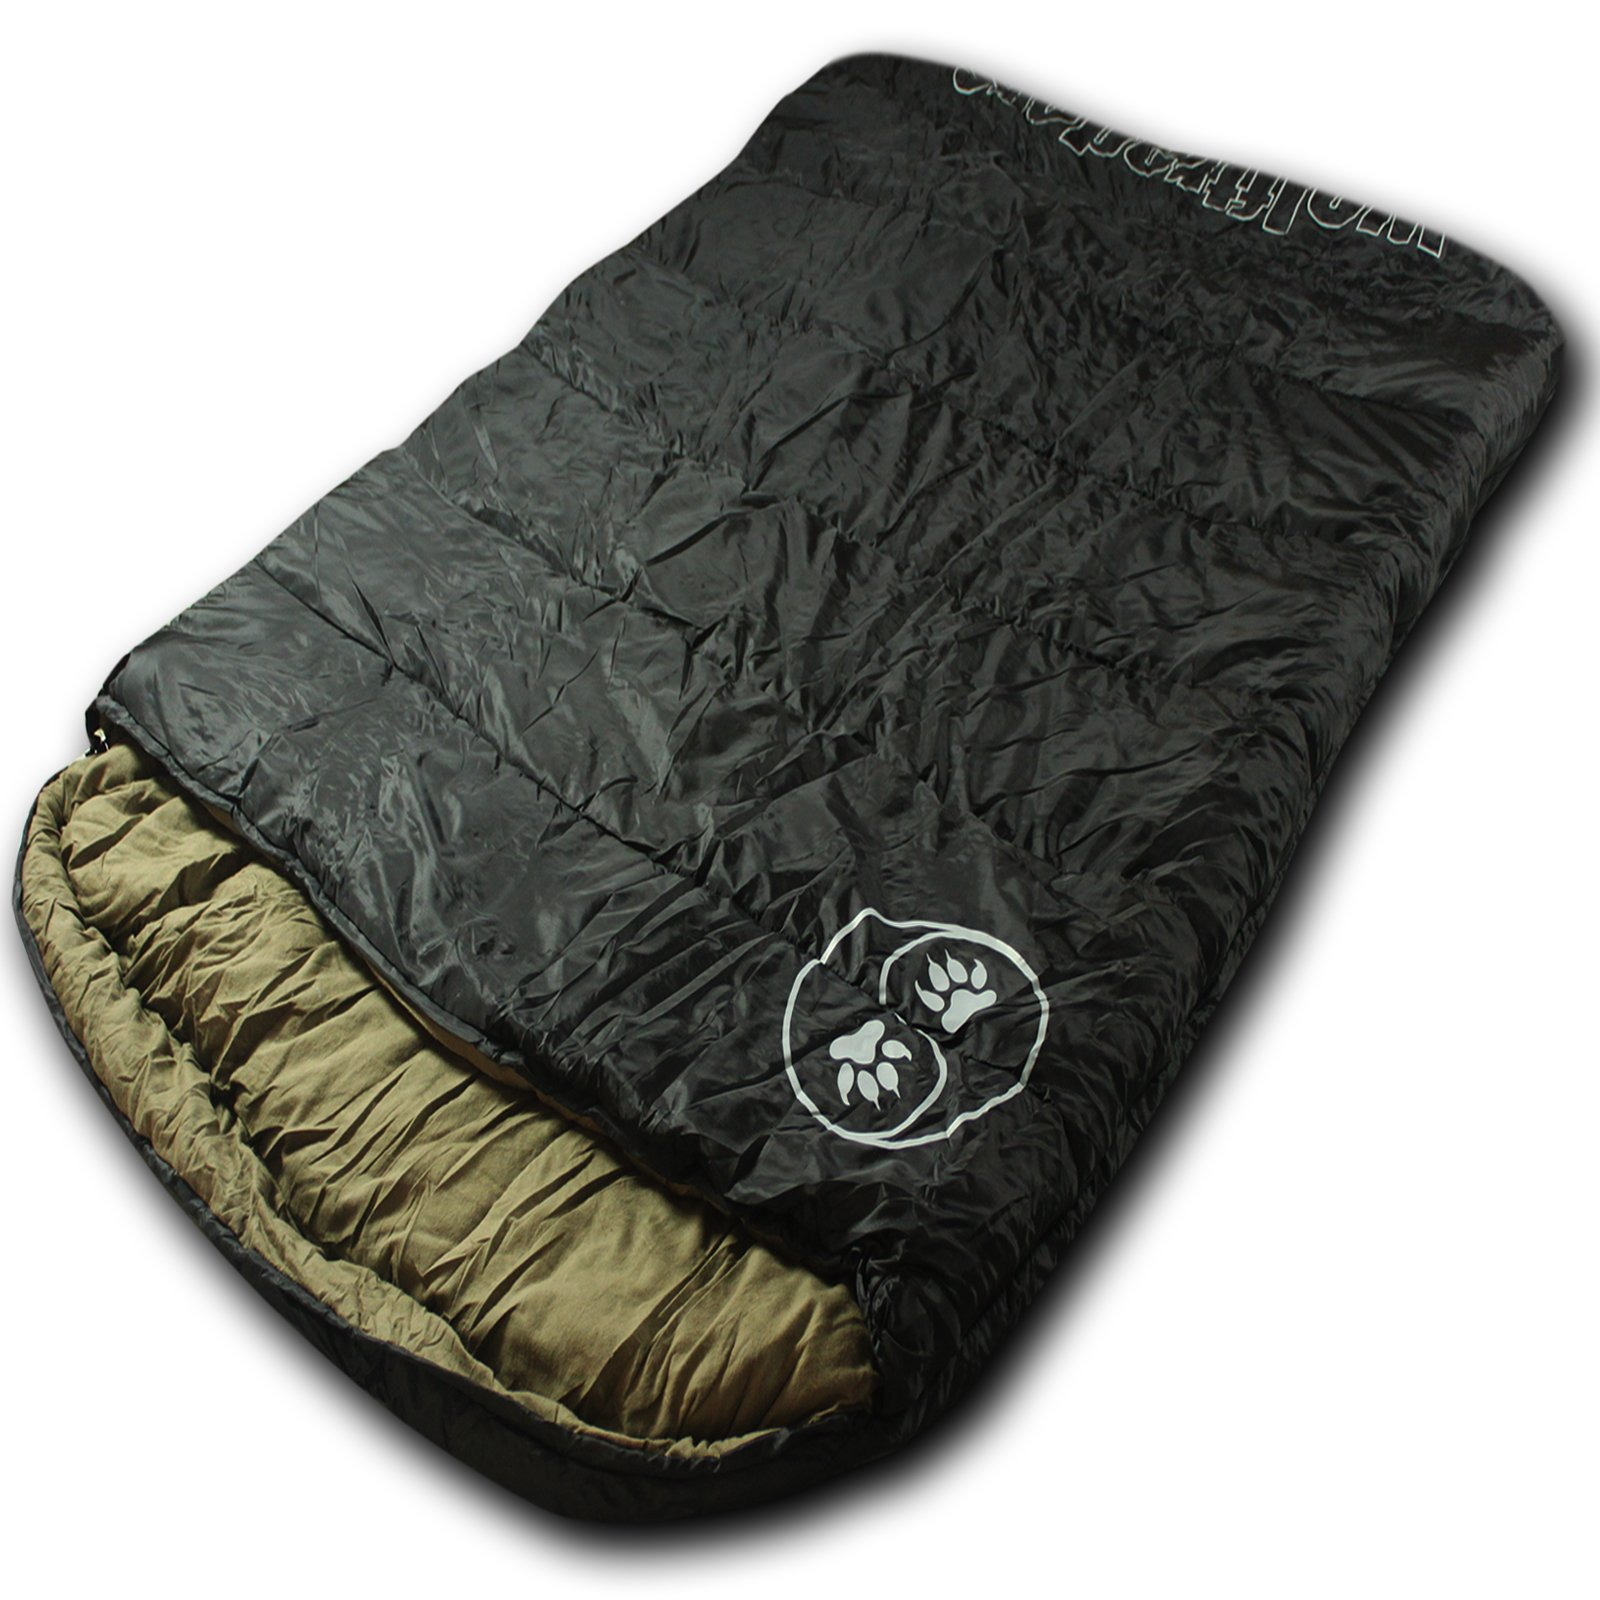 Wolftraders TwoWolves +20 Degree 2-Person Ripstop Premium Comfort Sleeping Bag, Black/Tan